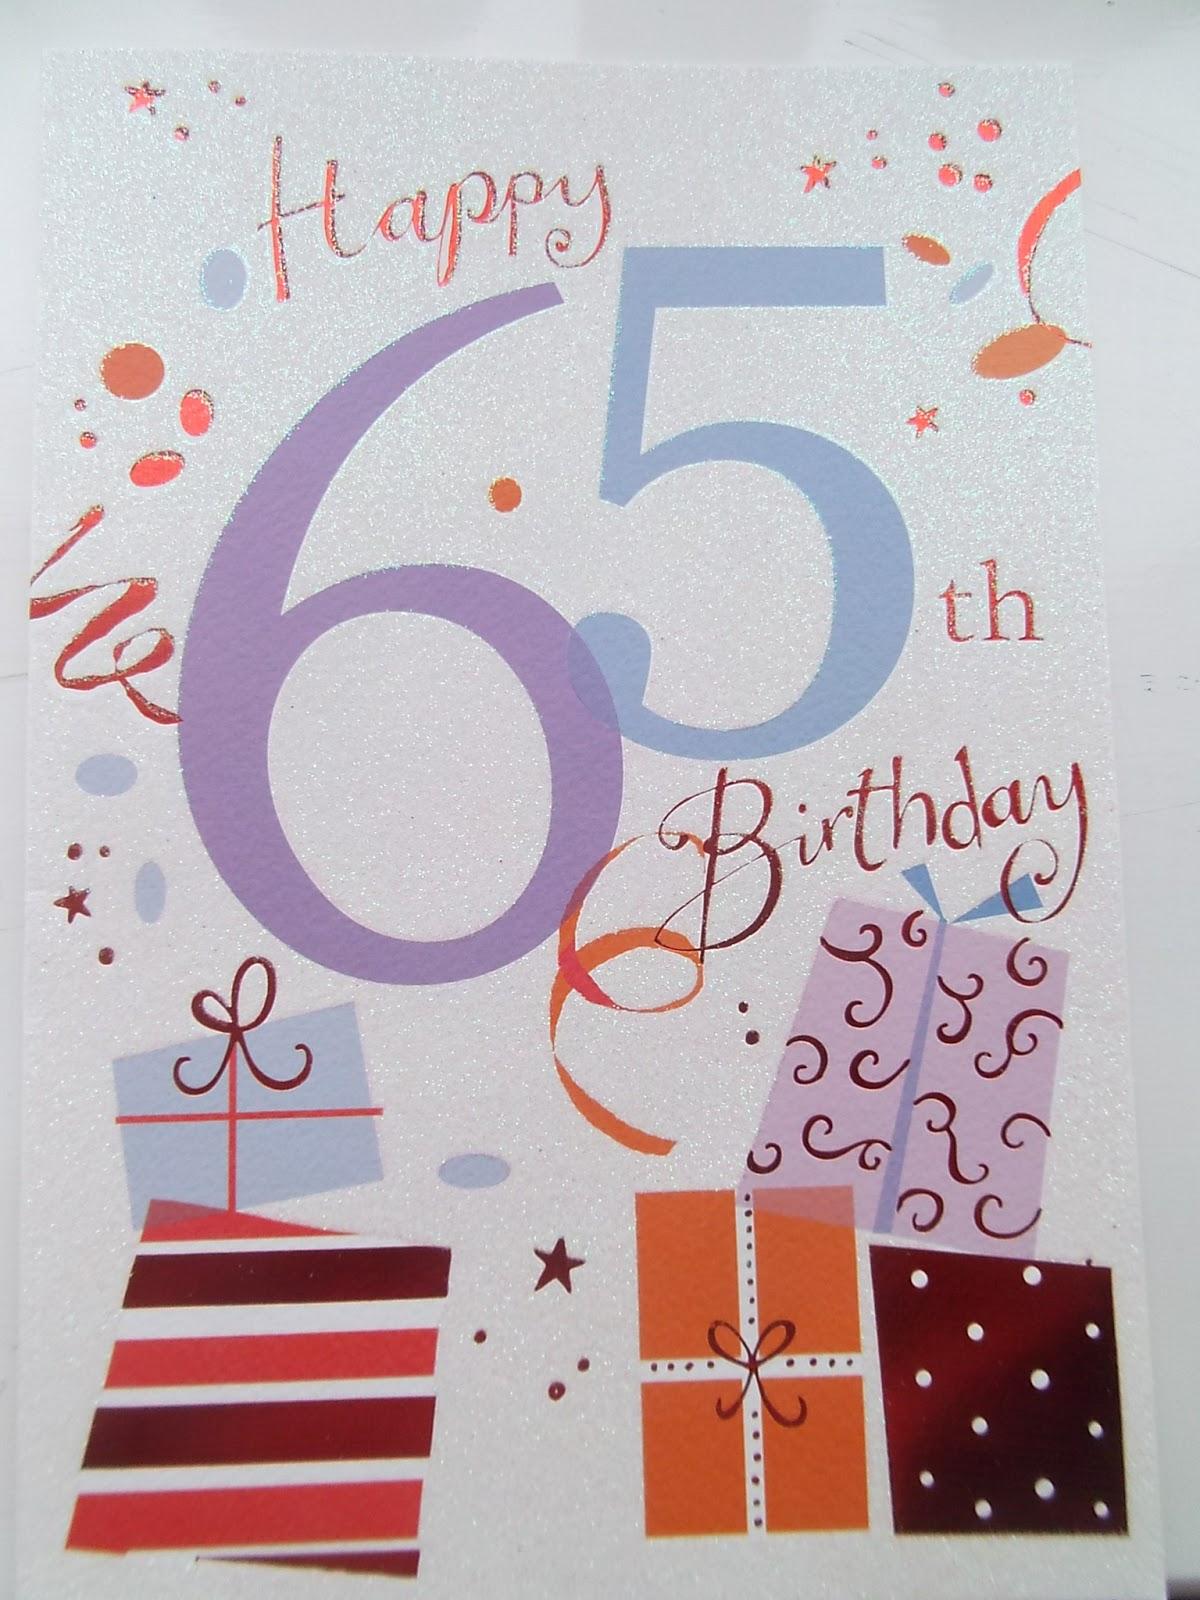 65th Birthday Fun On The North Yorkshire Moors Railway Pullman